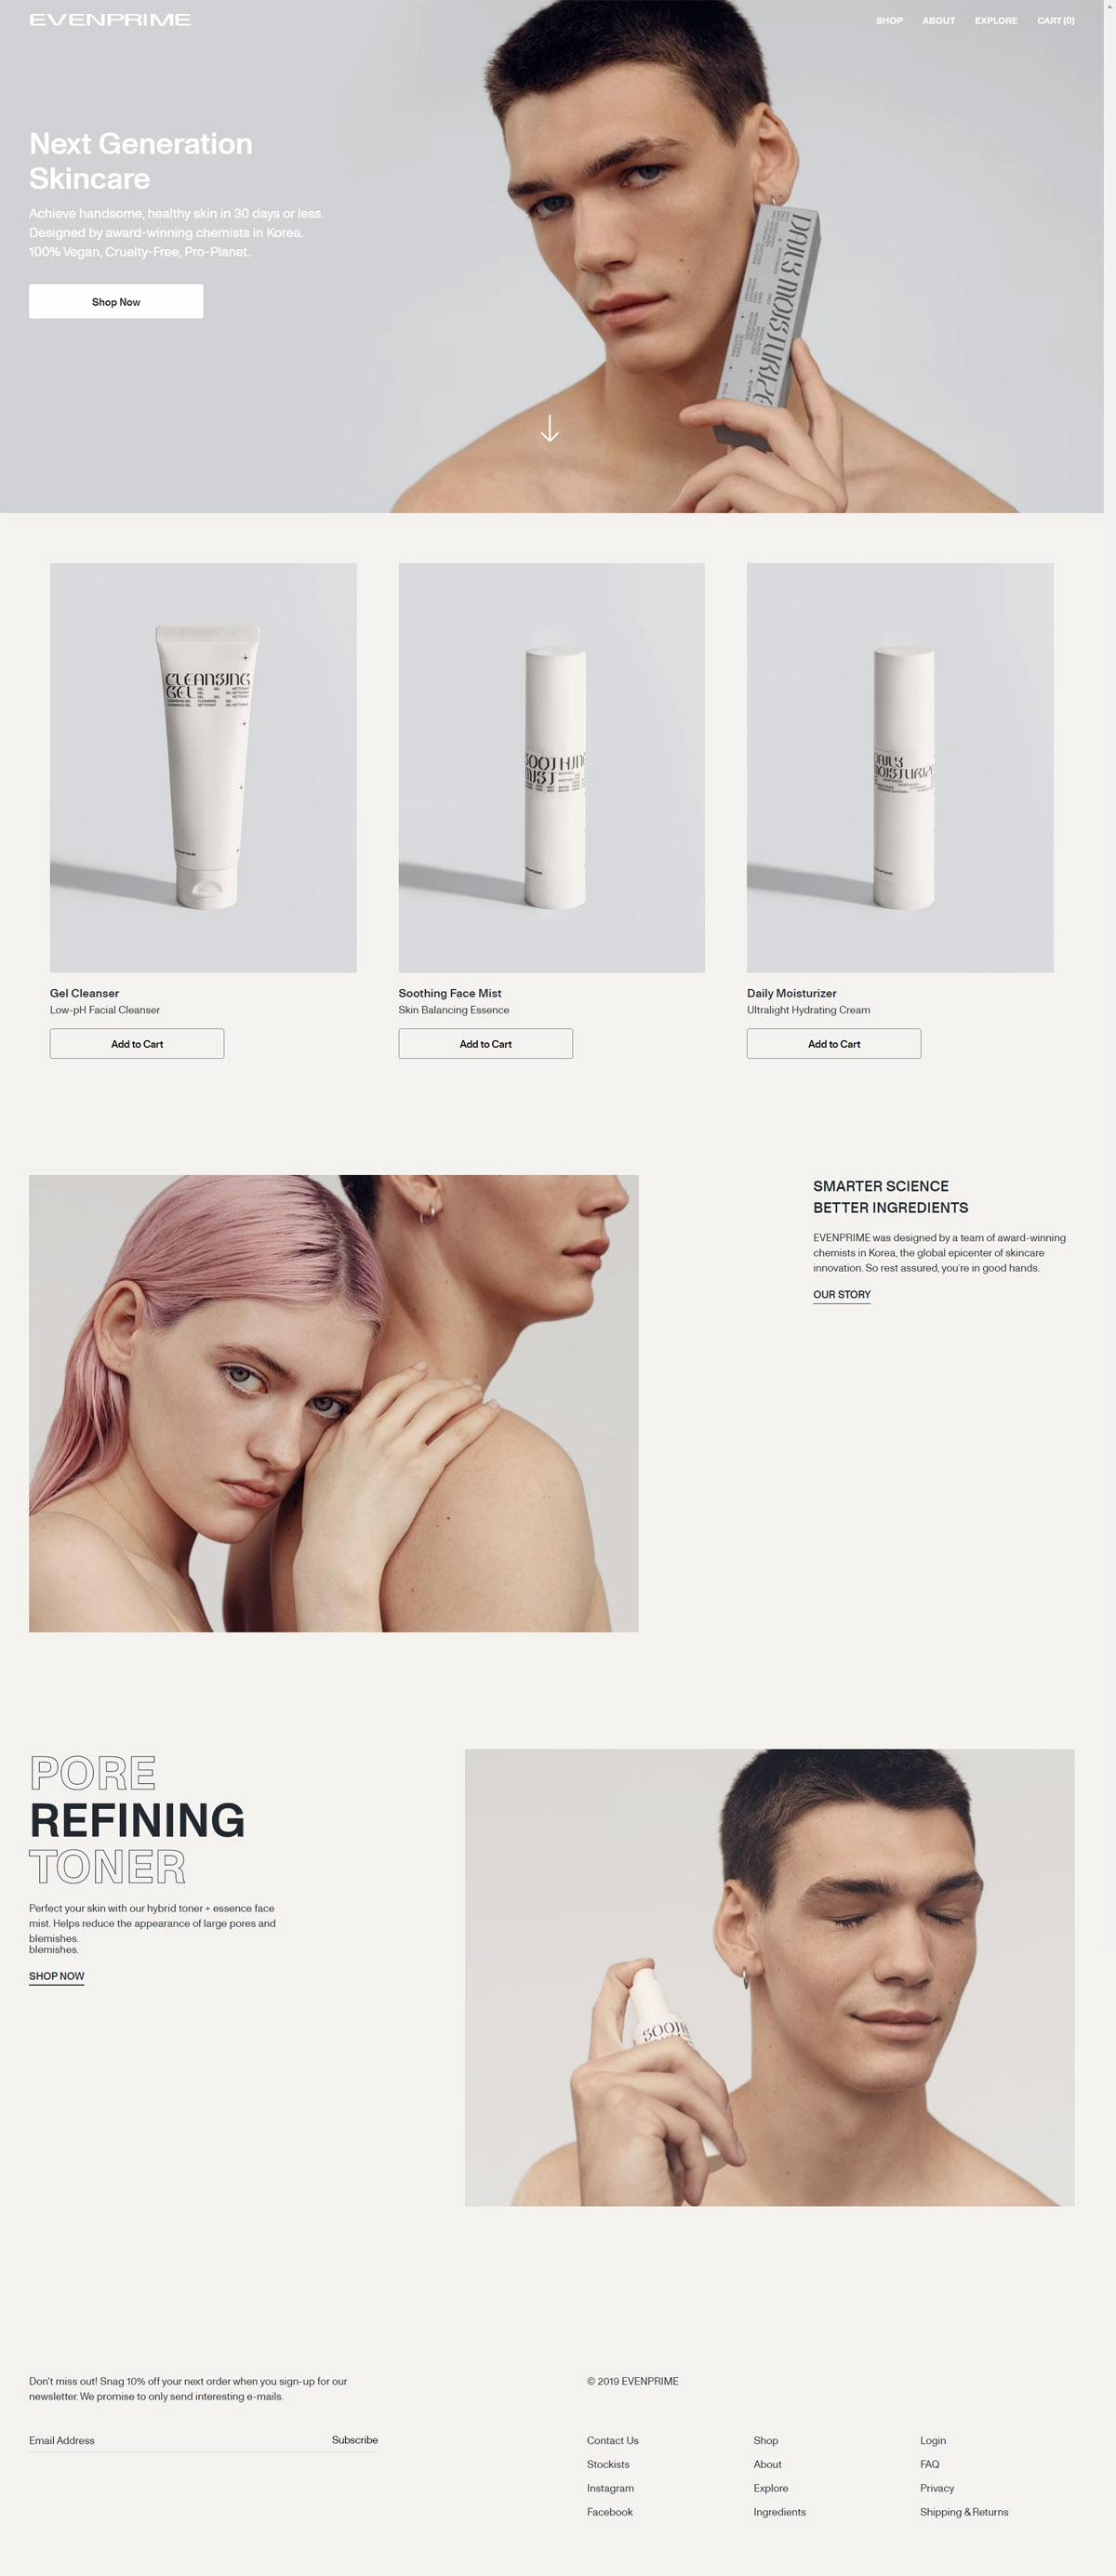 eCommerce website: EVENPRIME